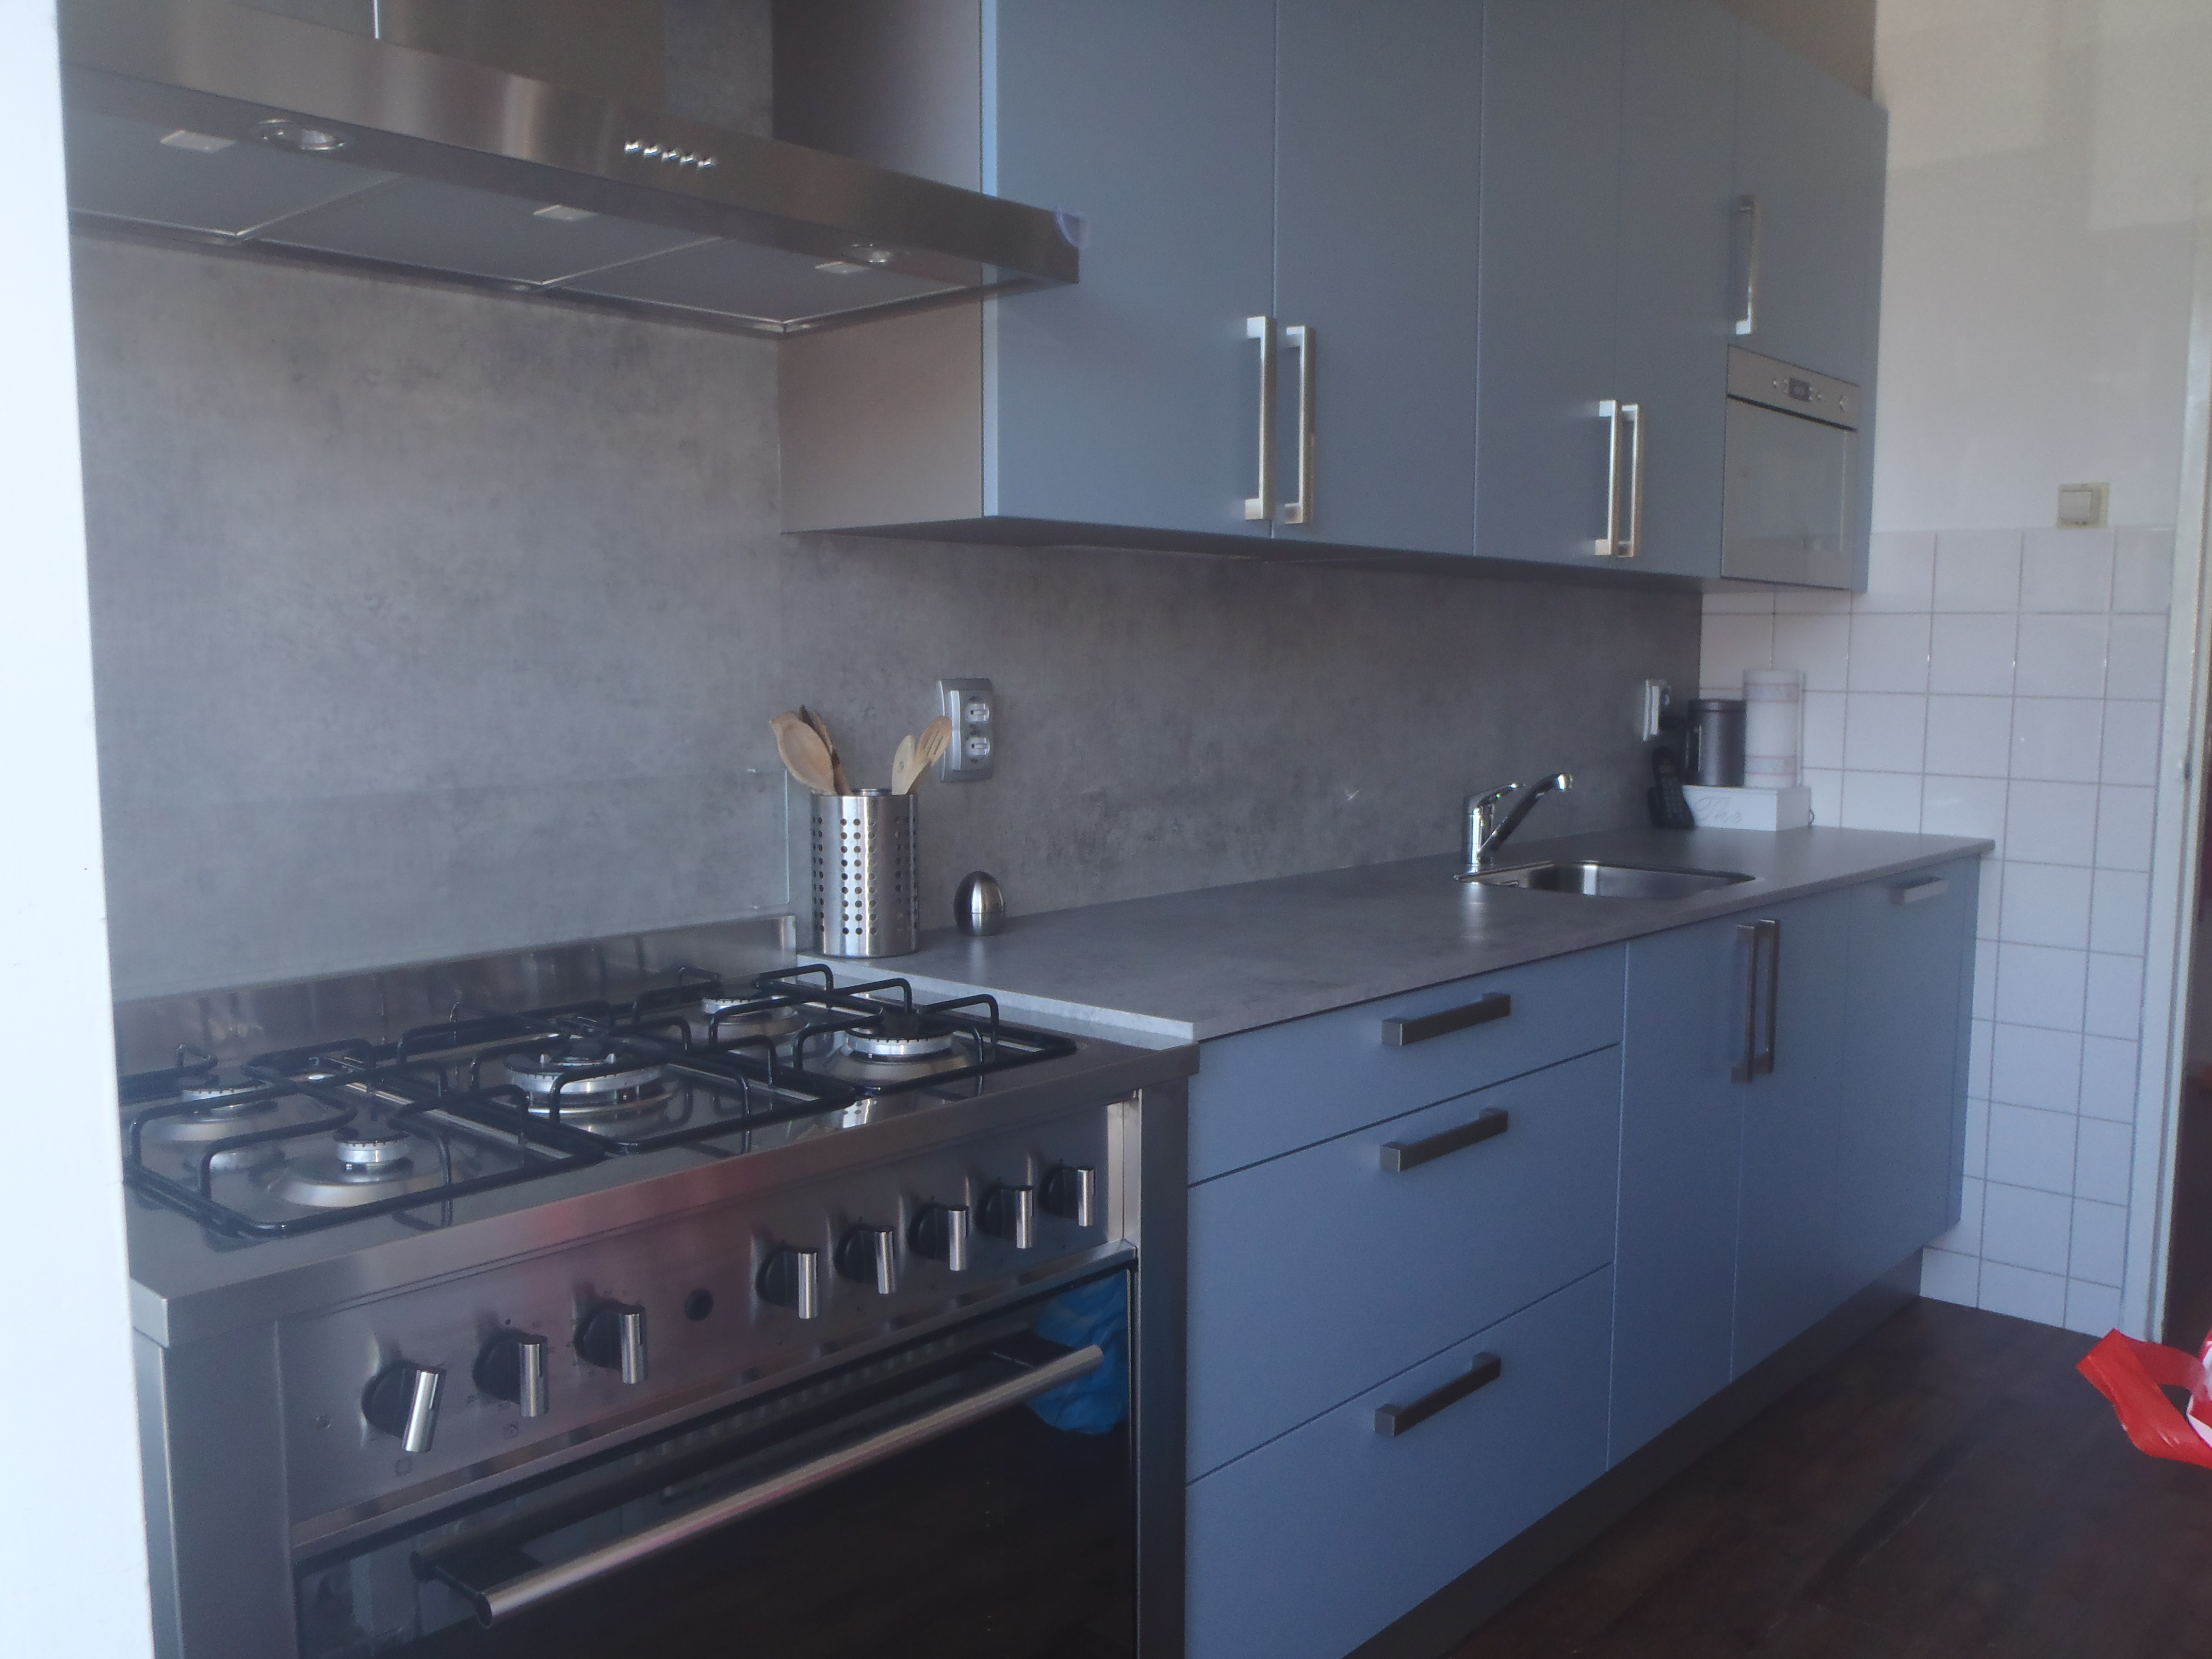 Grando Keukens Amsterdam : Keuken kopen amsterdam u2013 atumre.com